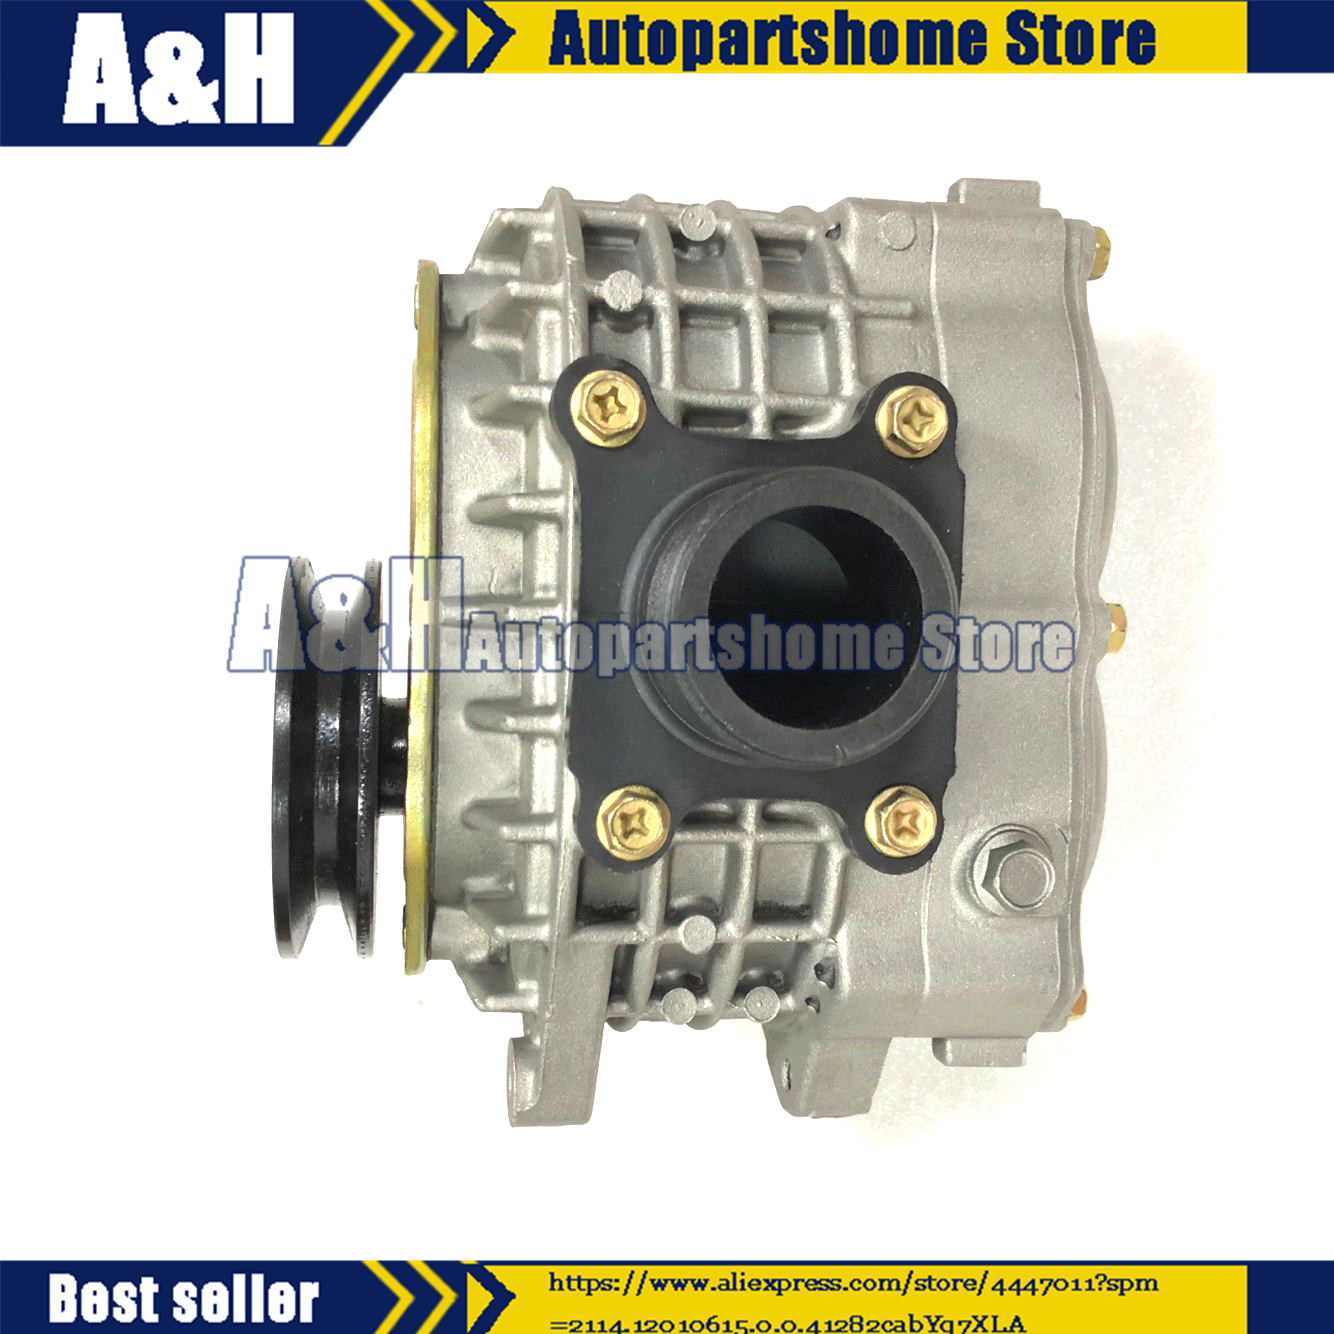 Remanufactured AMR500 for auto Roots supercharger Compressor blower booster mechanical Turbocharger Kompressor turbine 1.0 2.2L